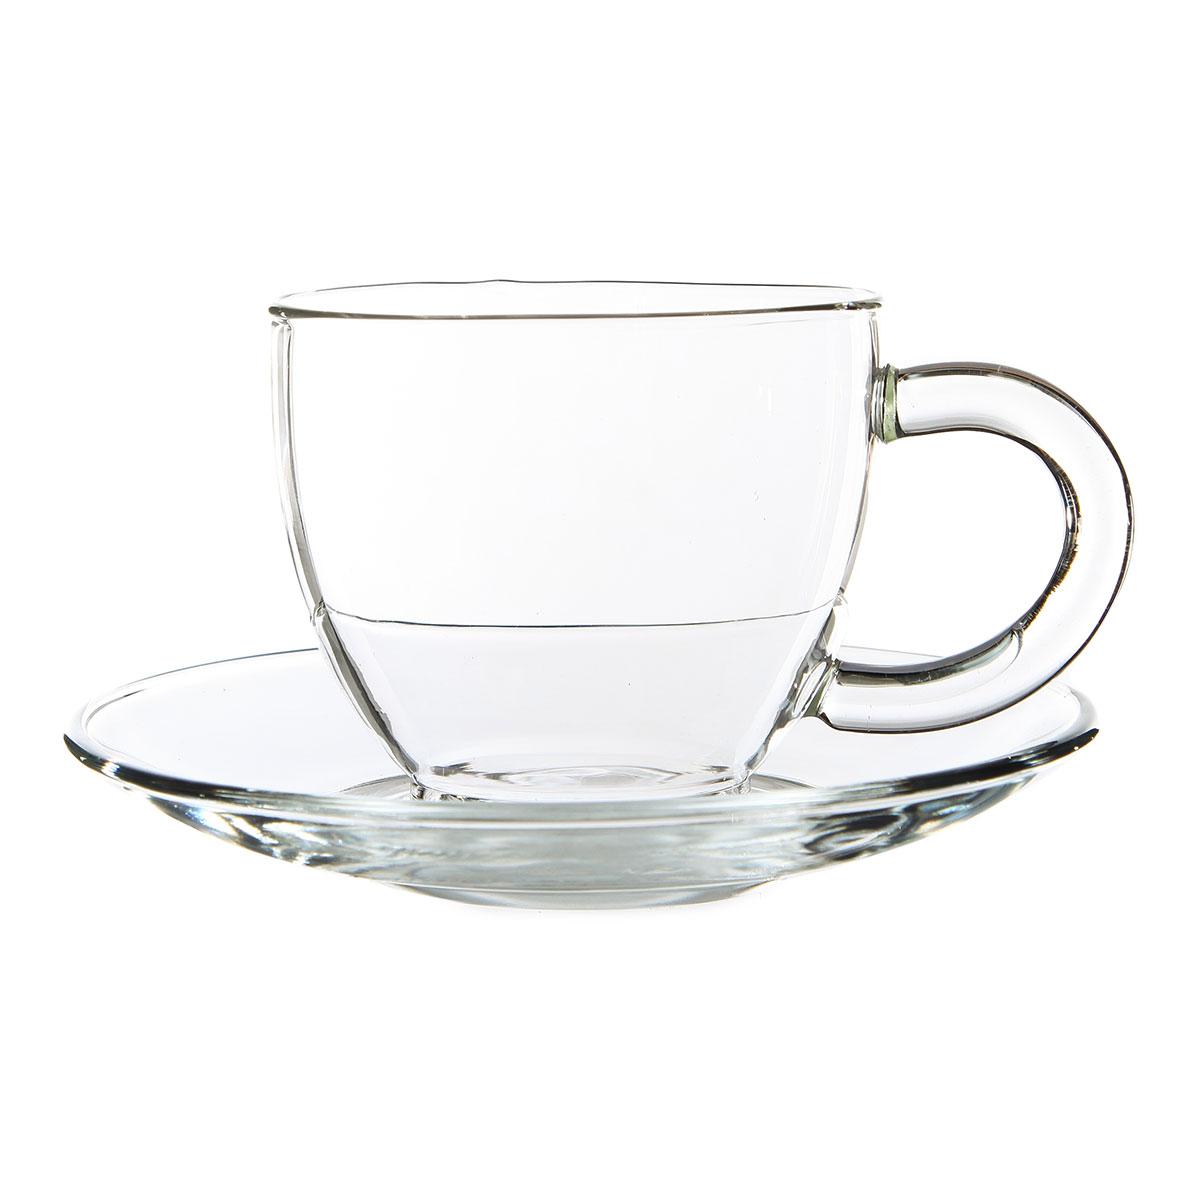 "Чайная пара ""Стеклянный бутон"", 150 мл"